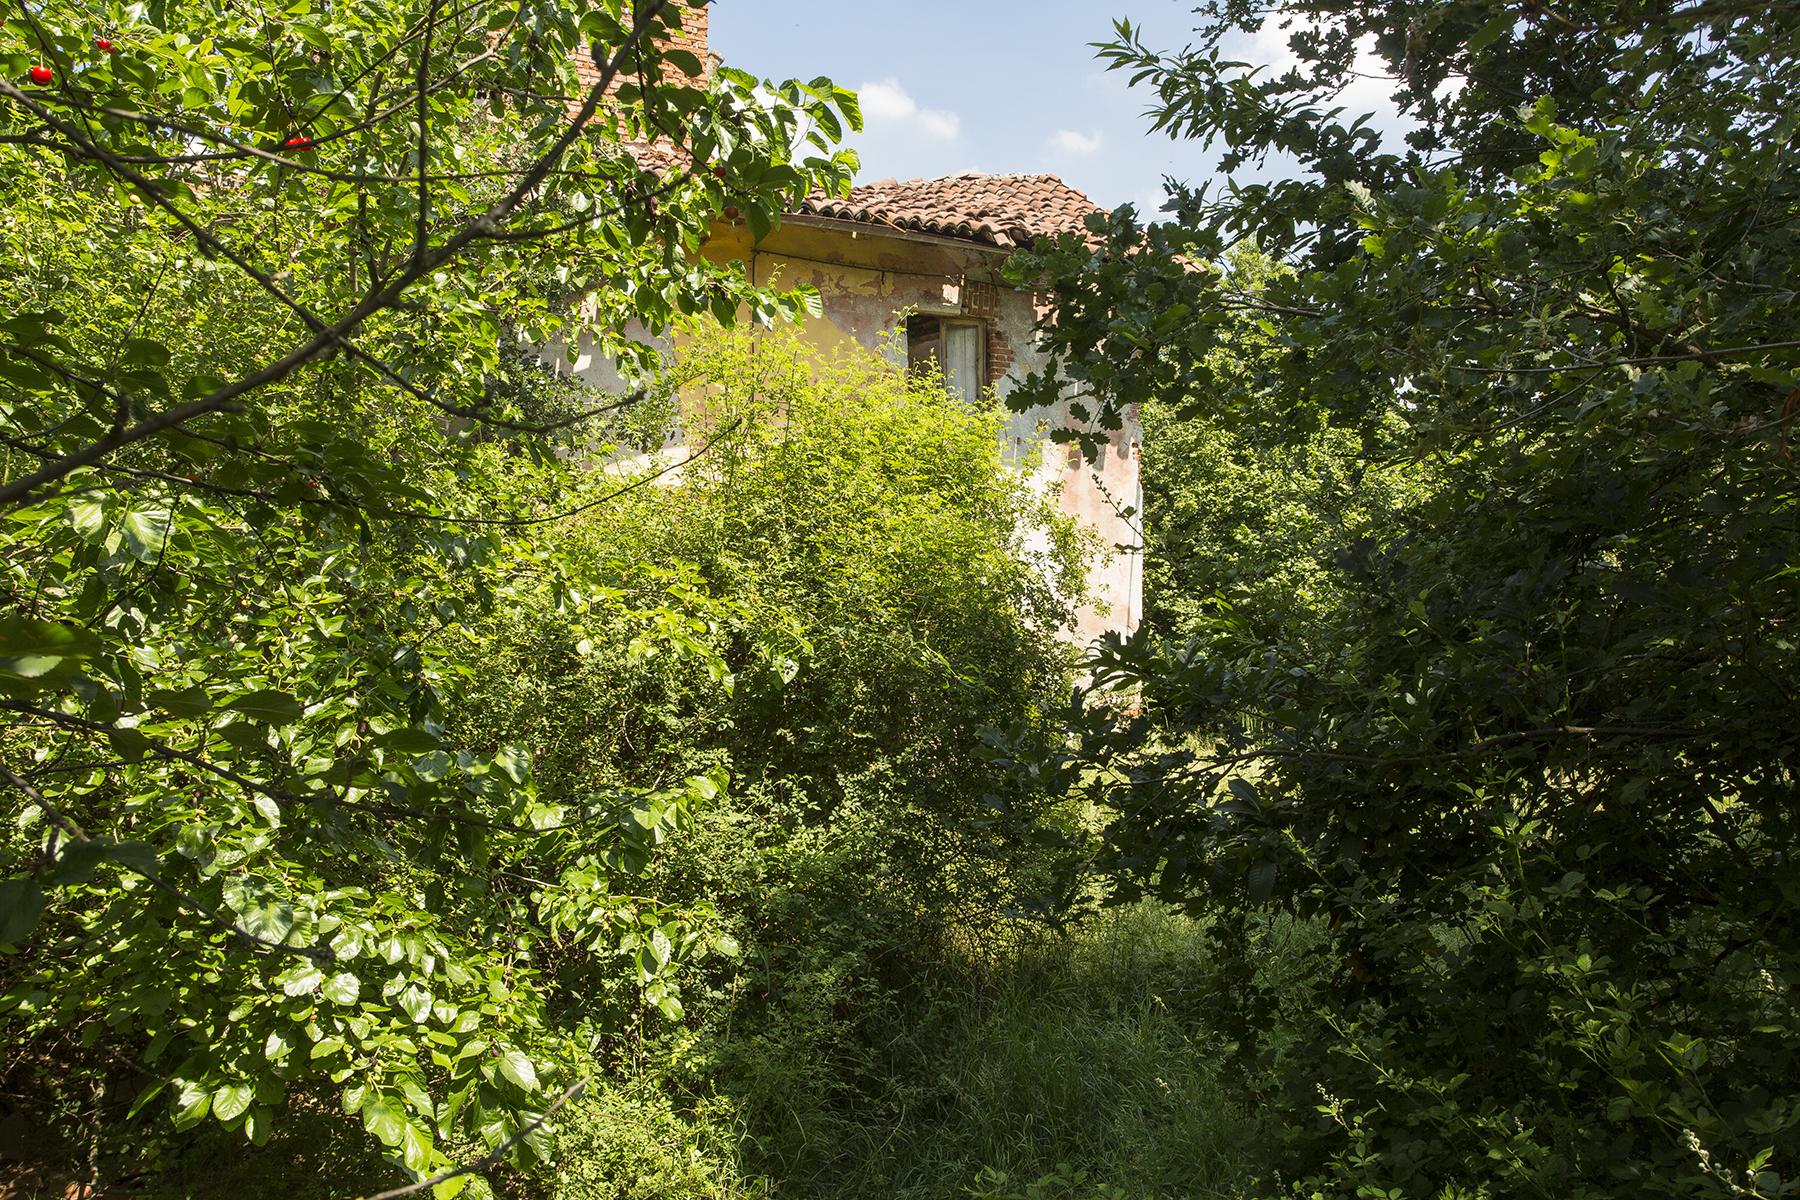 Rustico in Vendita a Novi Ligure: 5 locali, 300 mq - Foto 5